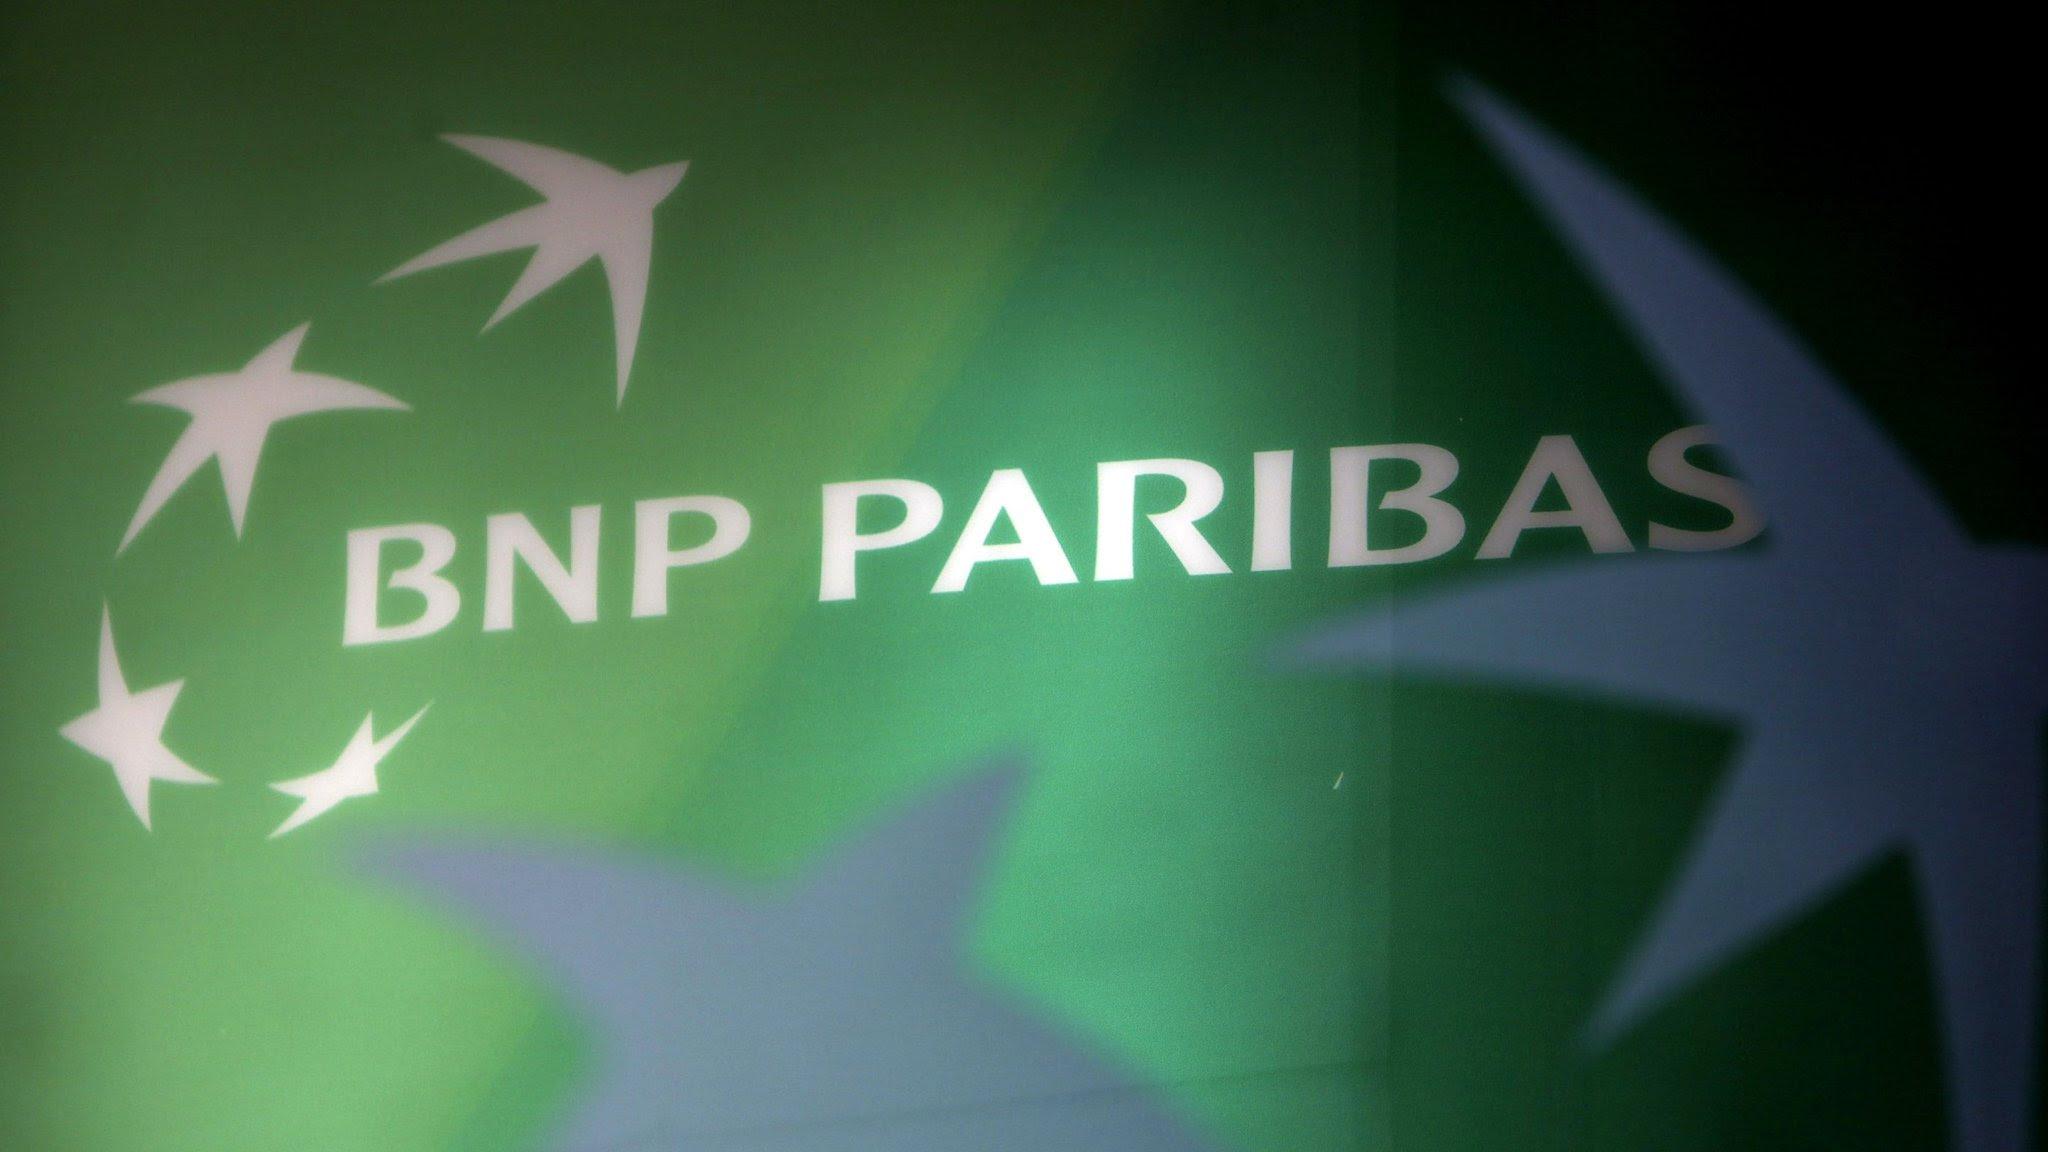 Bnp parbias forex trading